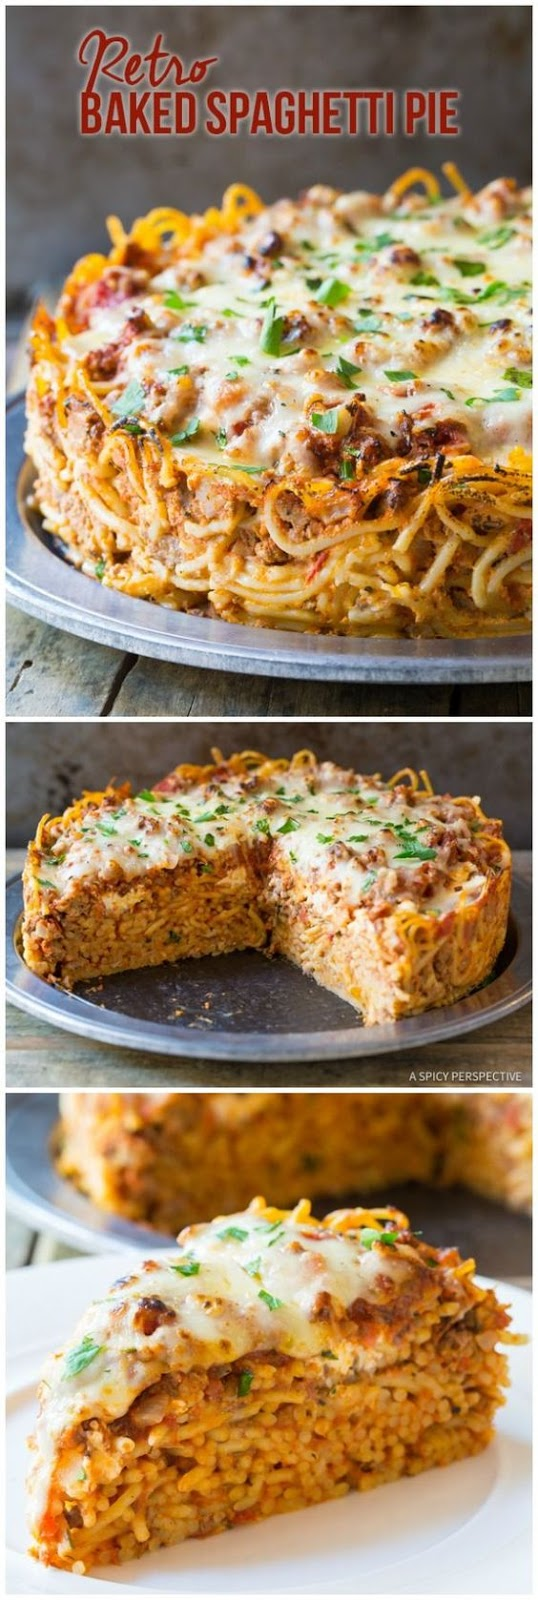 Baked Spaghetti Pie Recipe